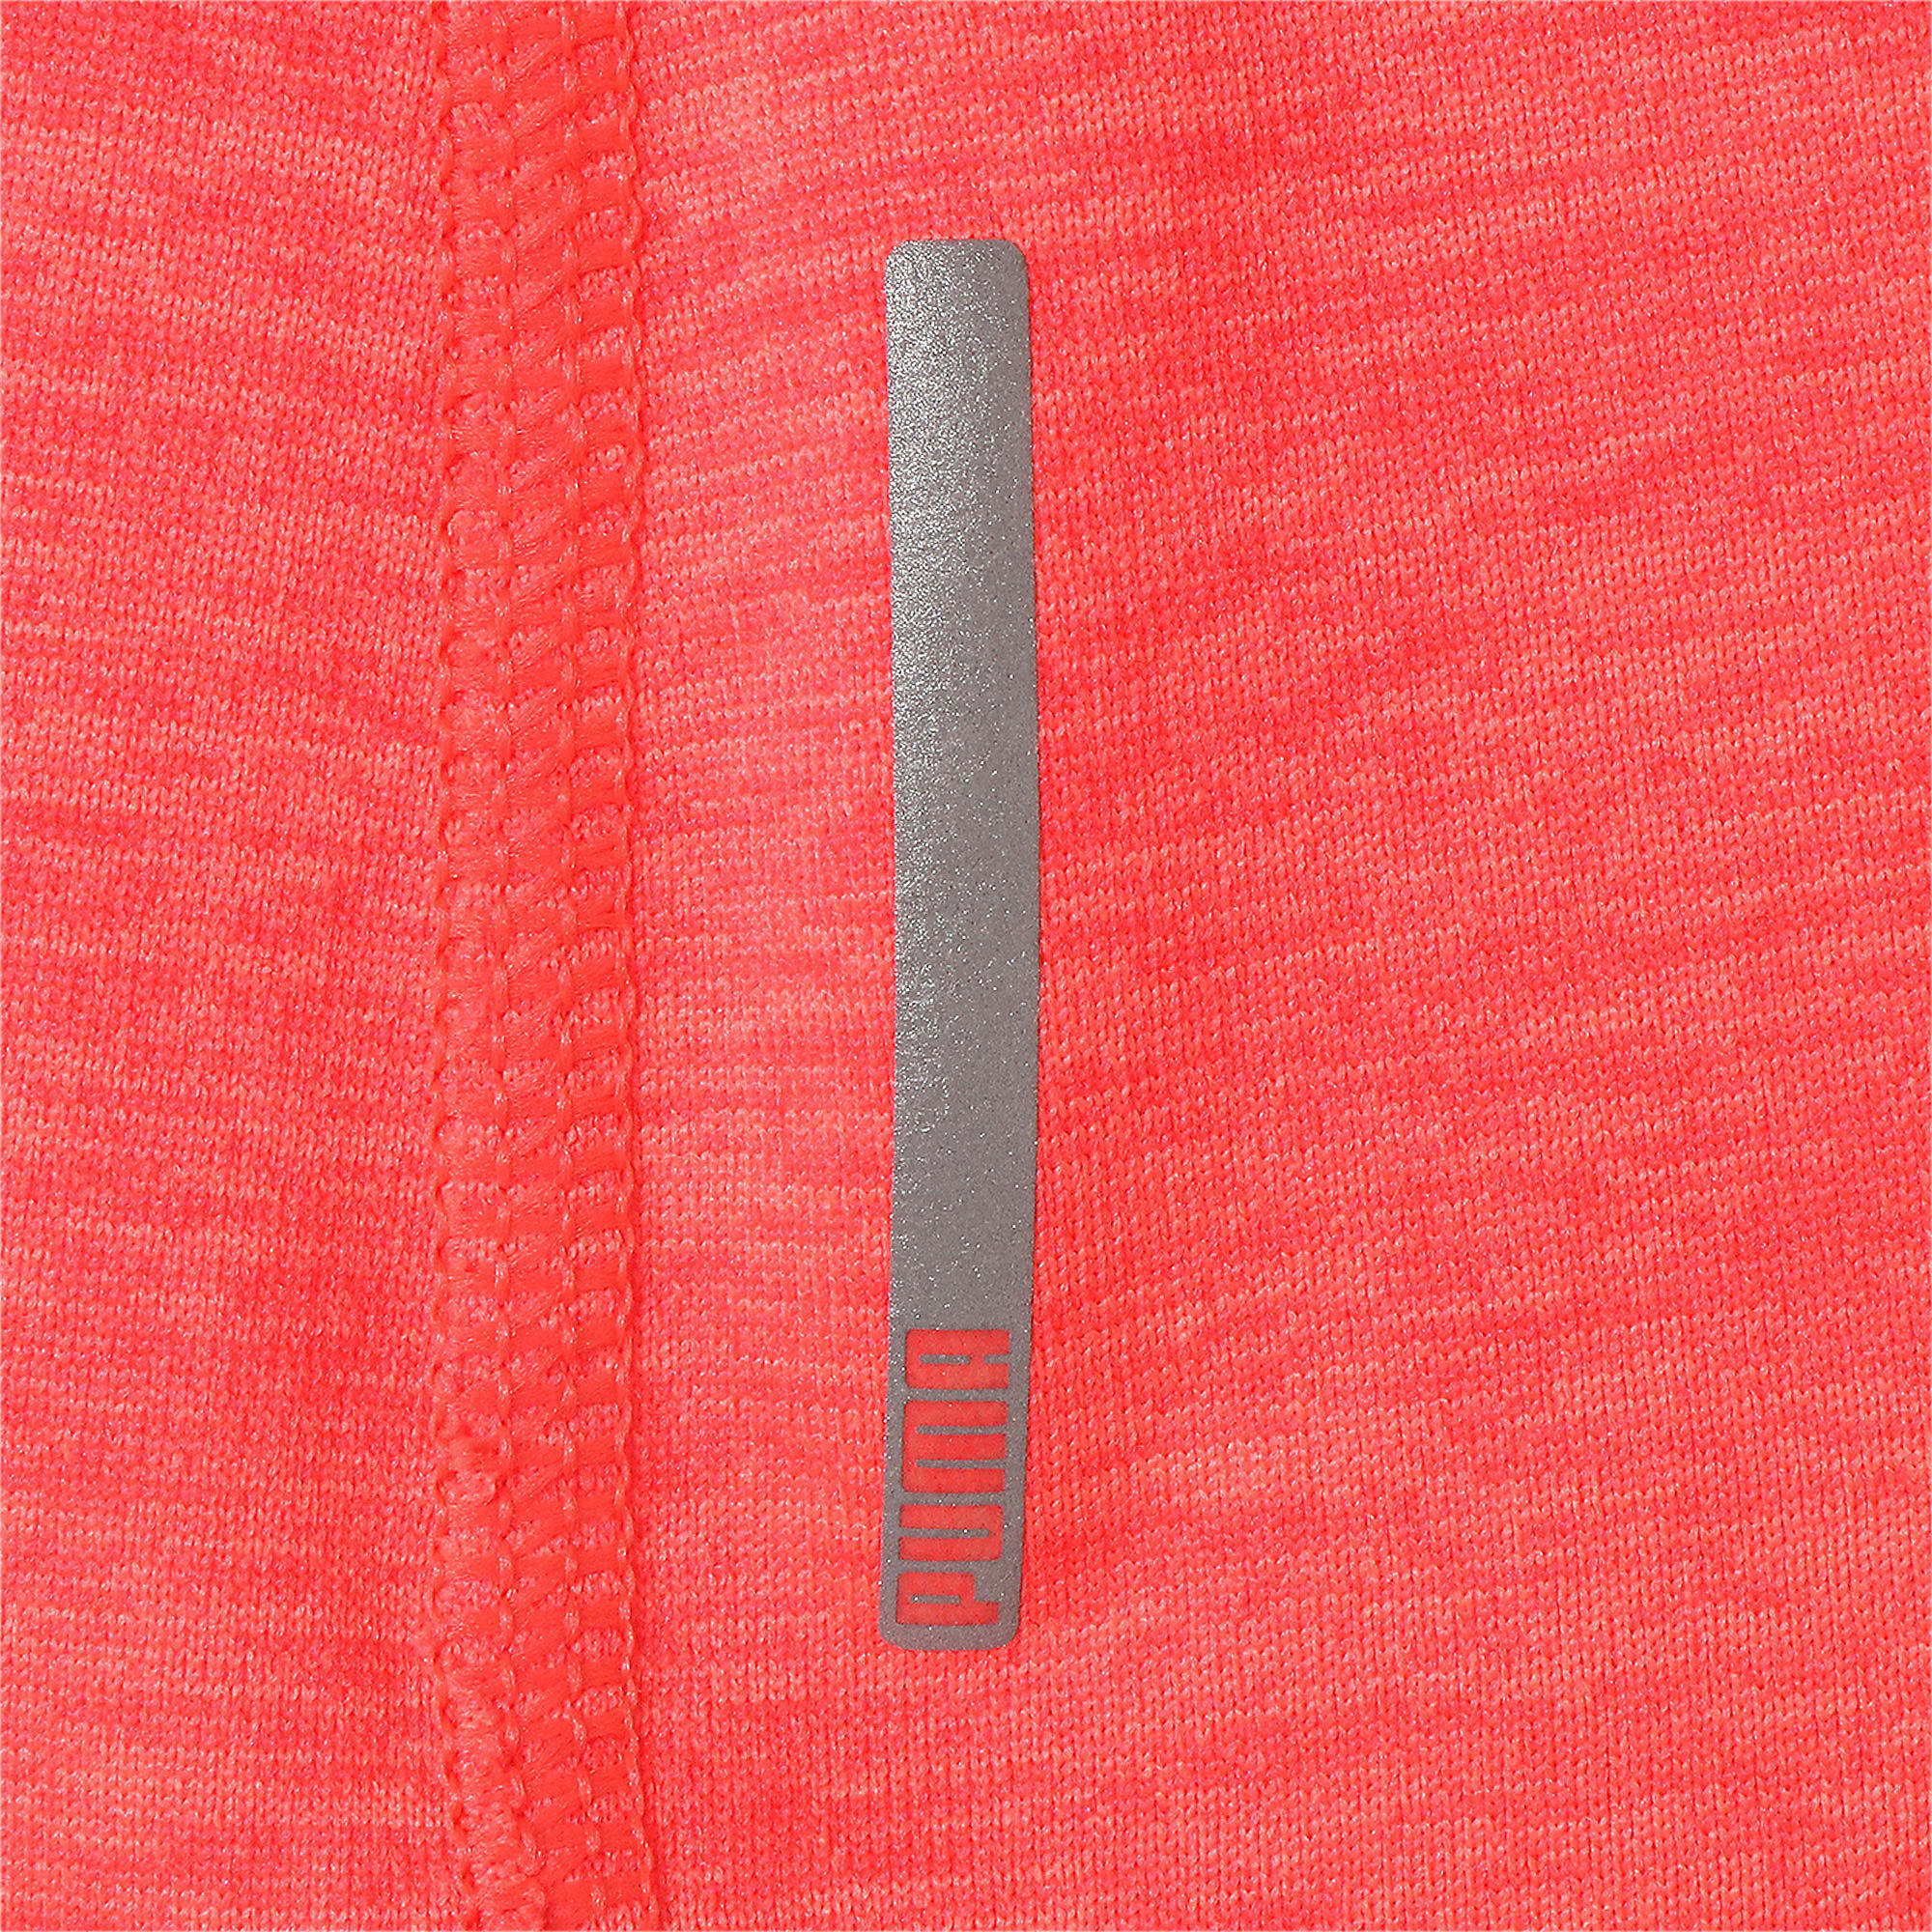 Thumbnail 10 of ヘザー キャット ウィメンズ ランニング Tシャツ 半袖, Pink Alert, medium-JPN